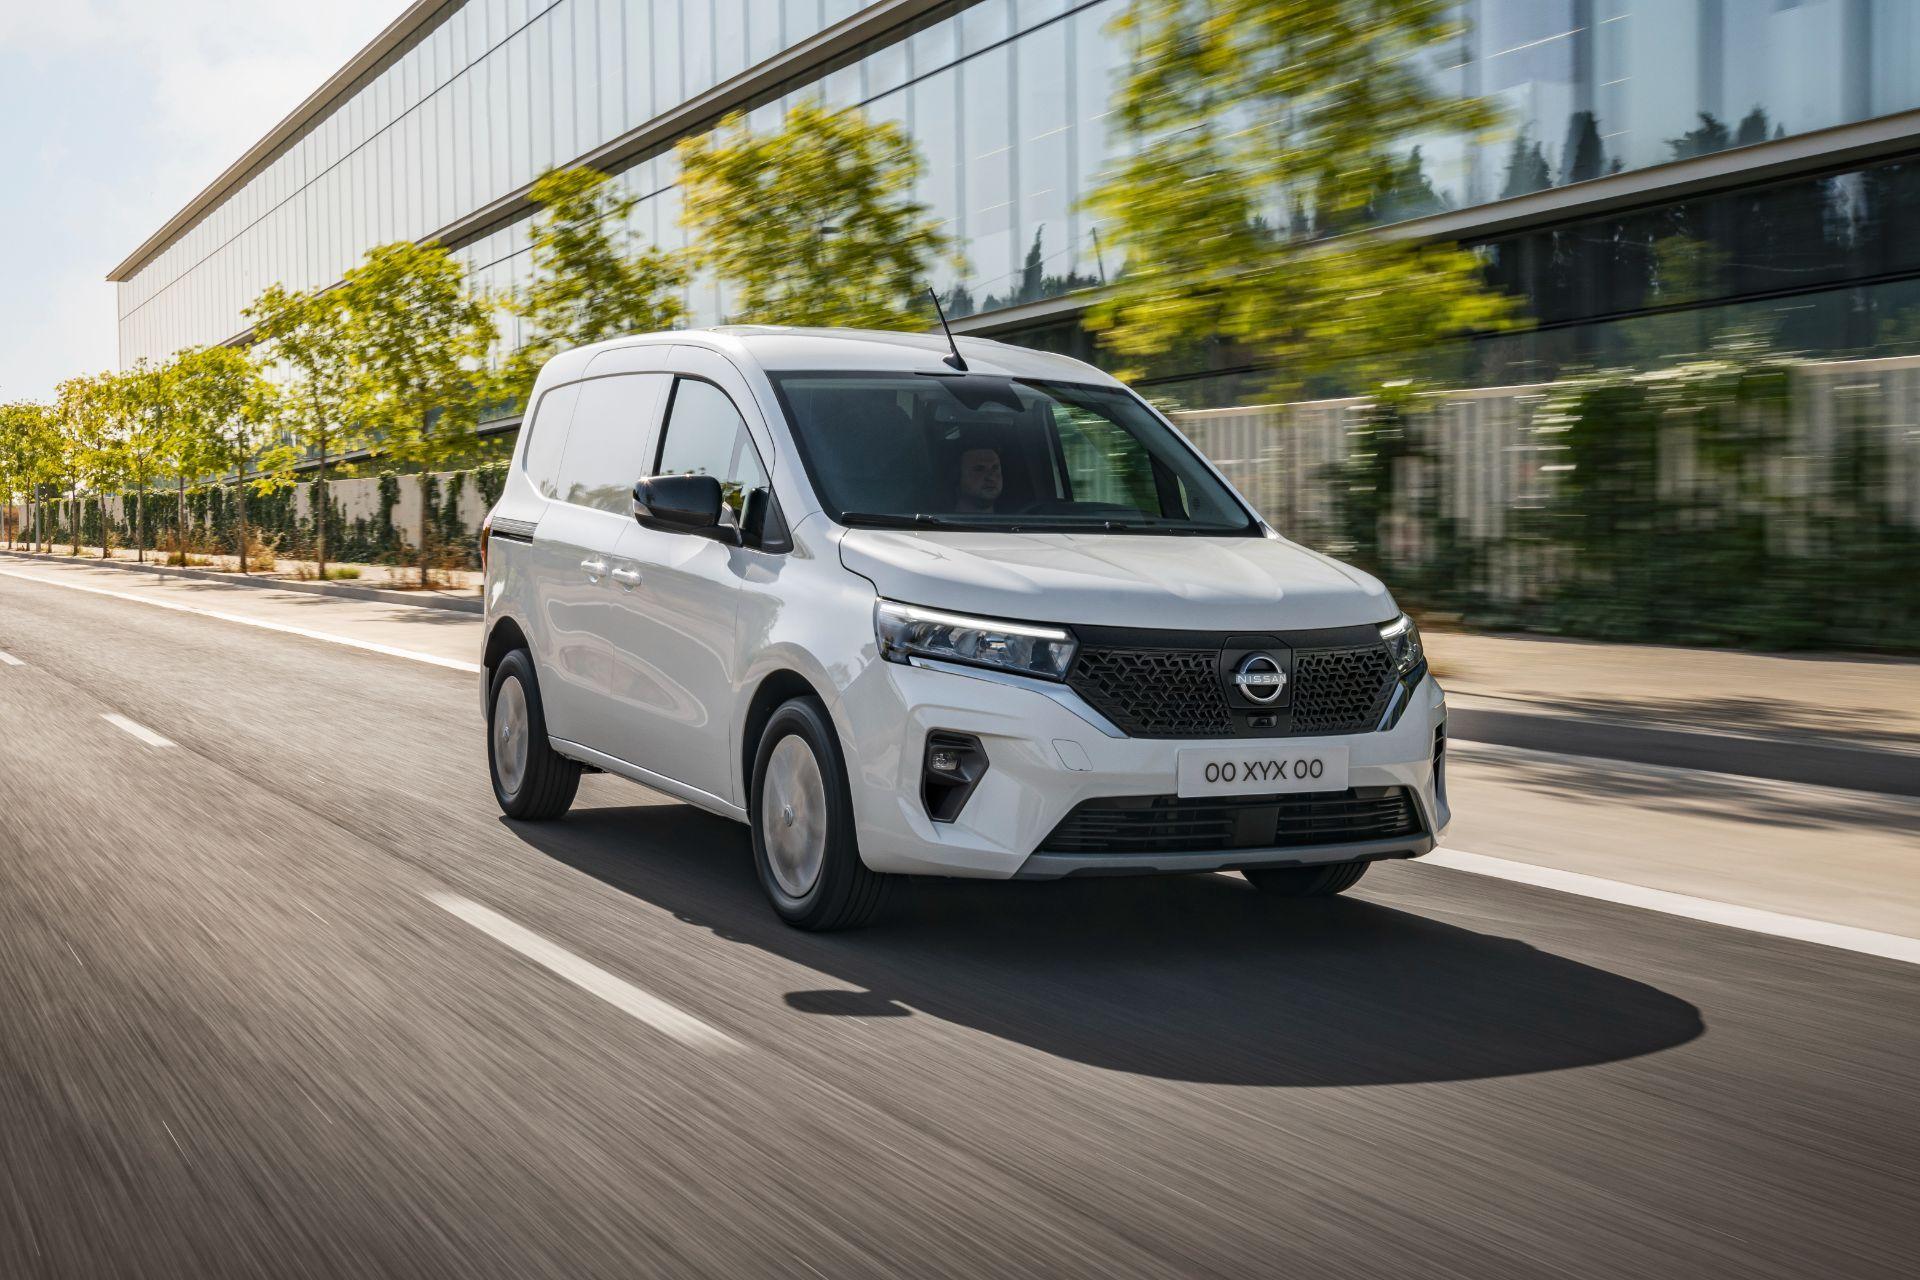 2022-Nissan-Townstar-EV-van-dynamic-4